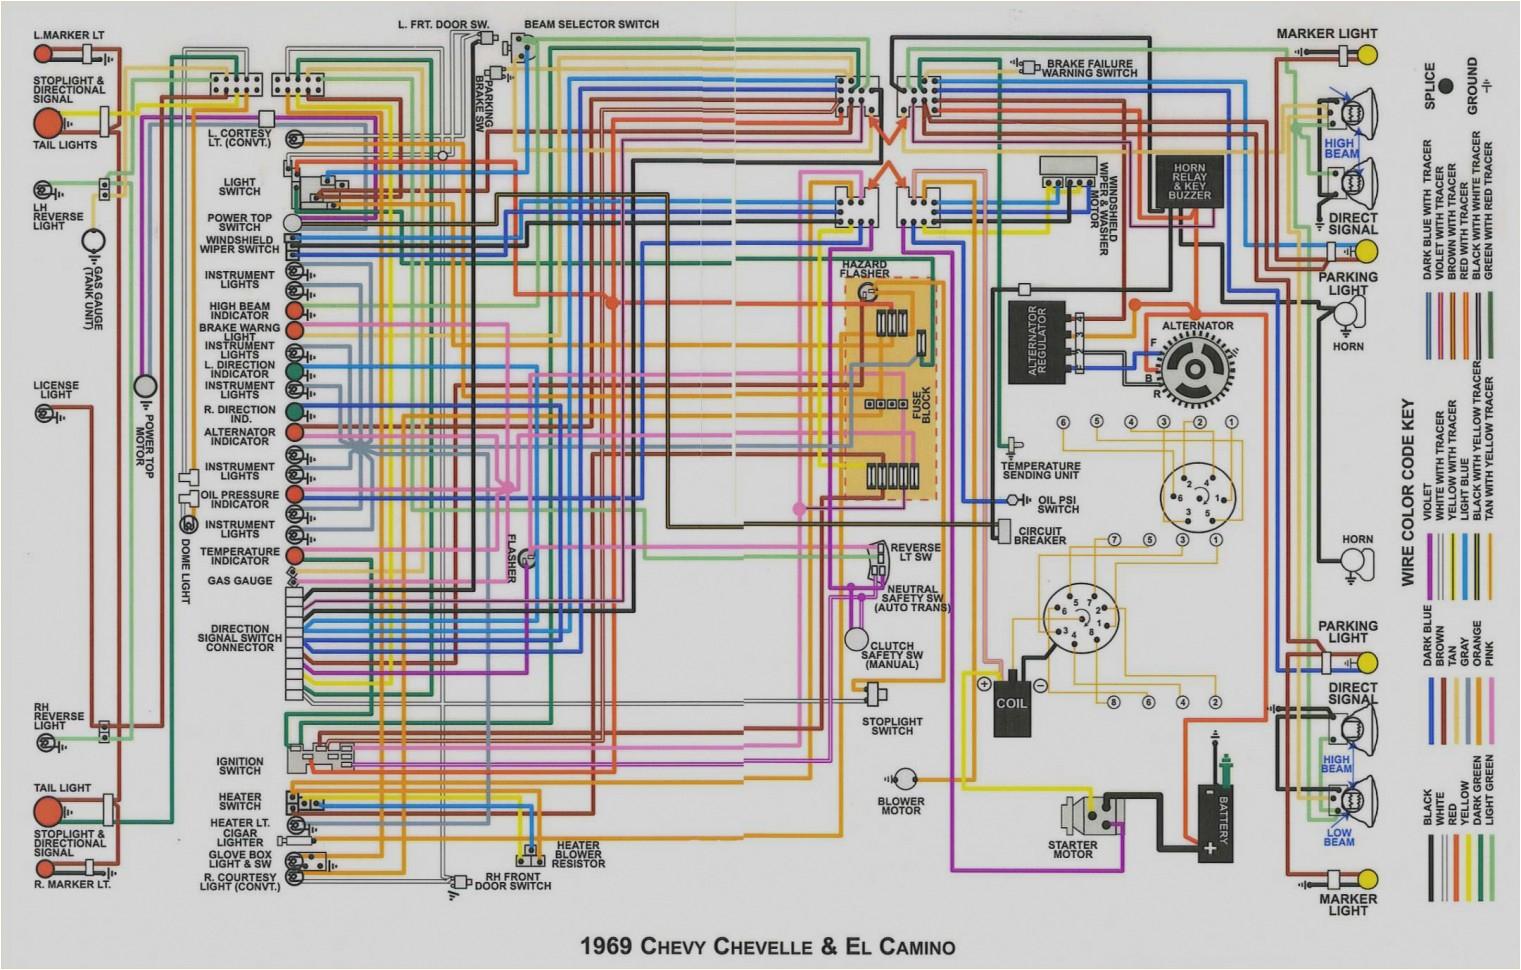 fuse box diagram 1966 el camino chevelle worksheet and wiring rh bookinc co 65 el camino